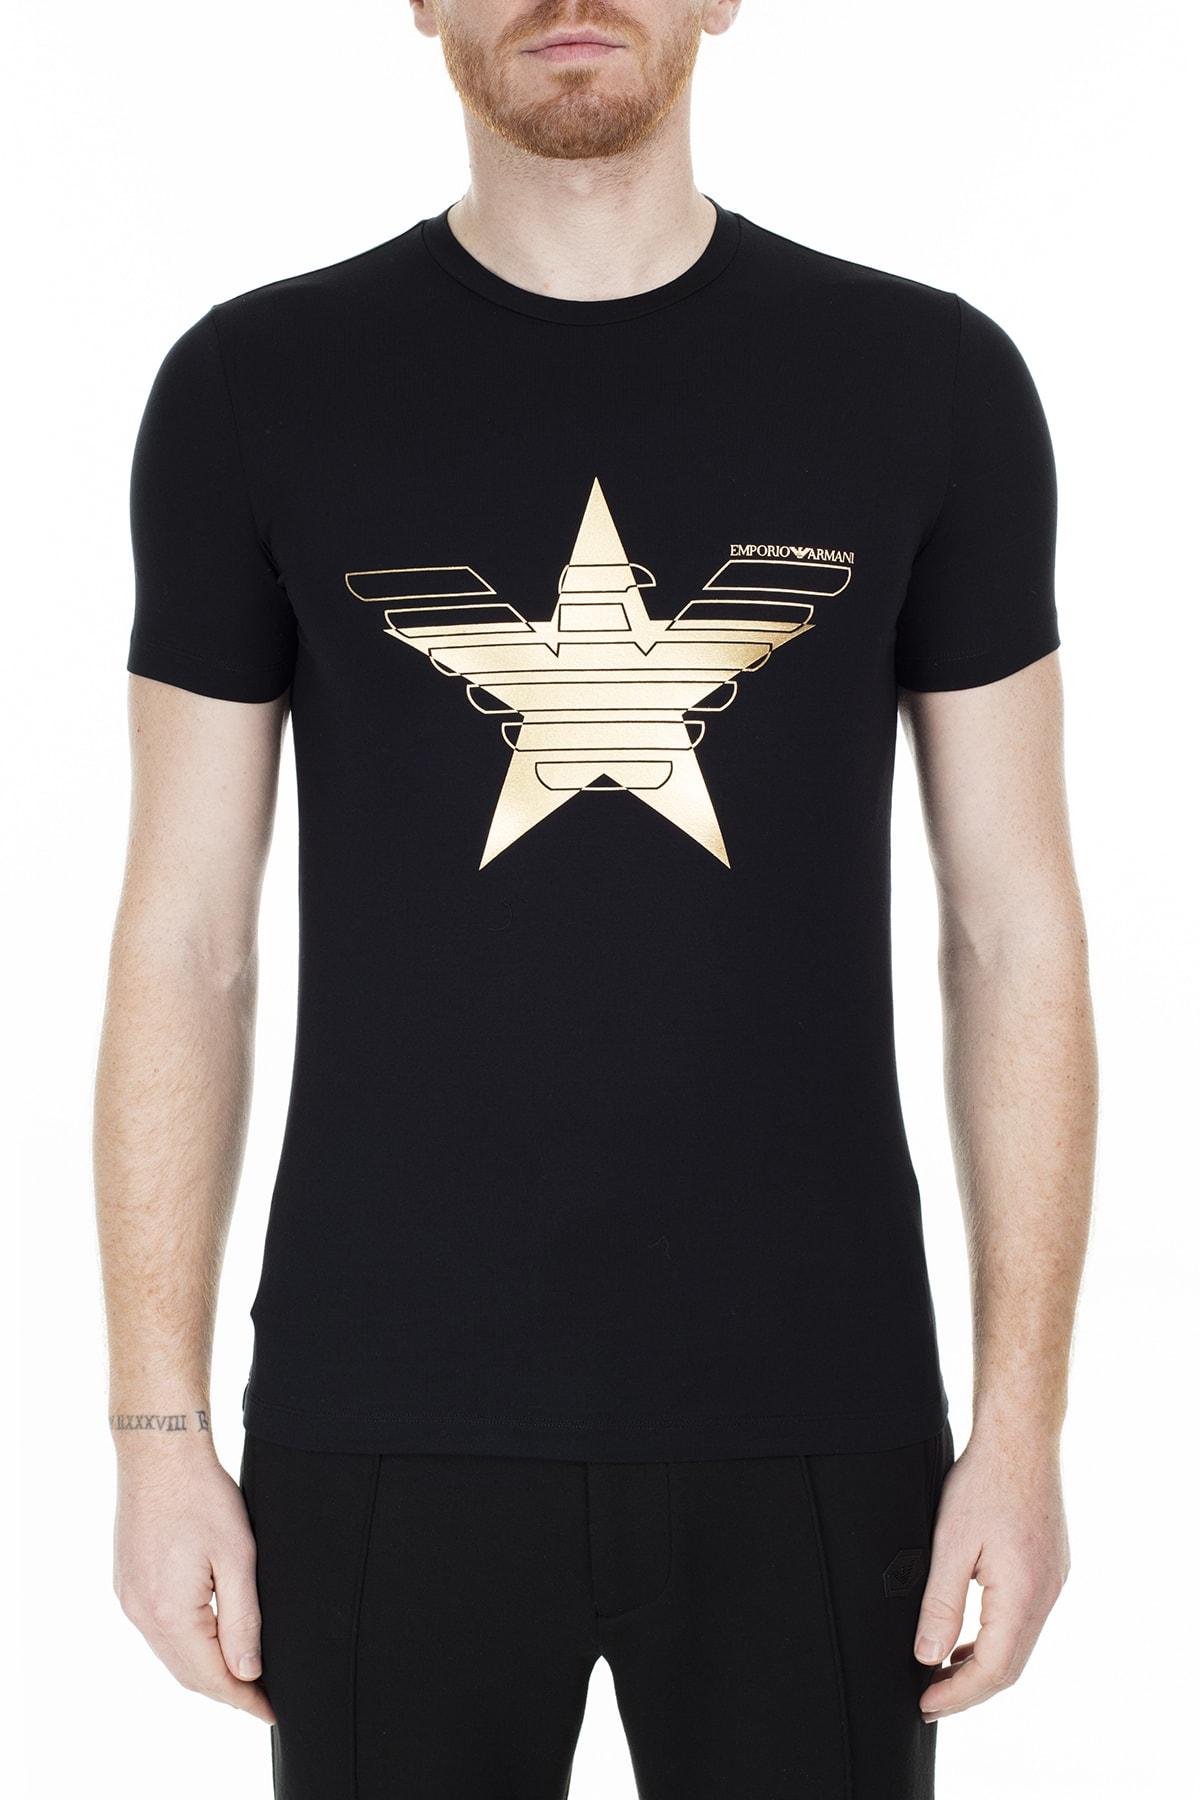 Emporio Armani Slim Fit T Shirt Erkek T Shirt S 6G1Tb6 1J0Az 0999 S 6G1TB6 1J0AZ 0999